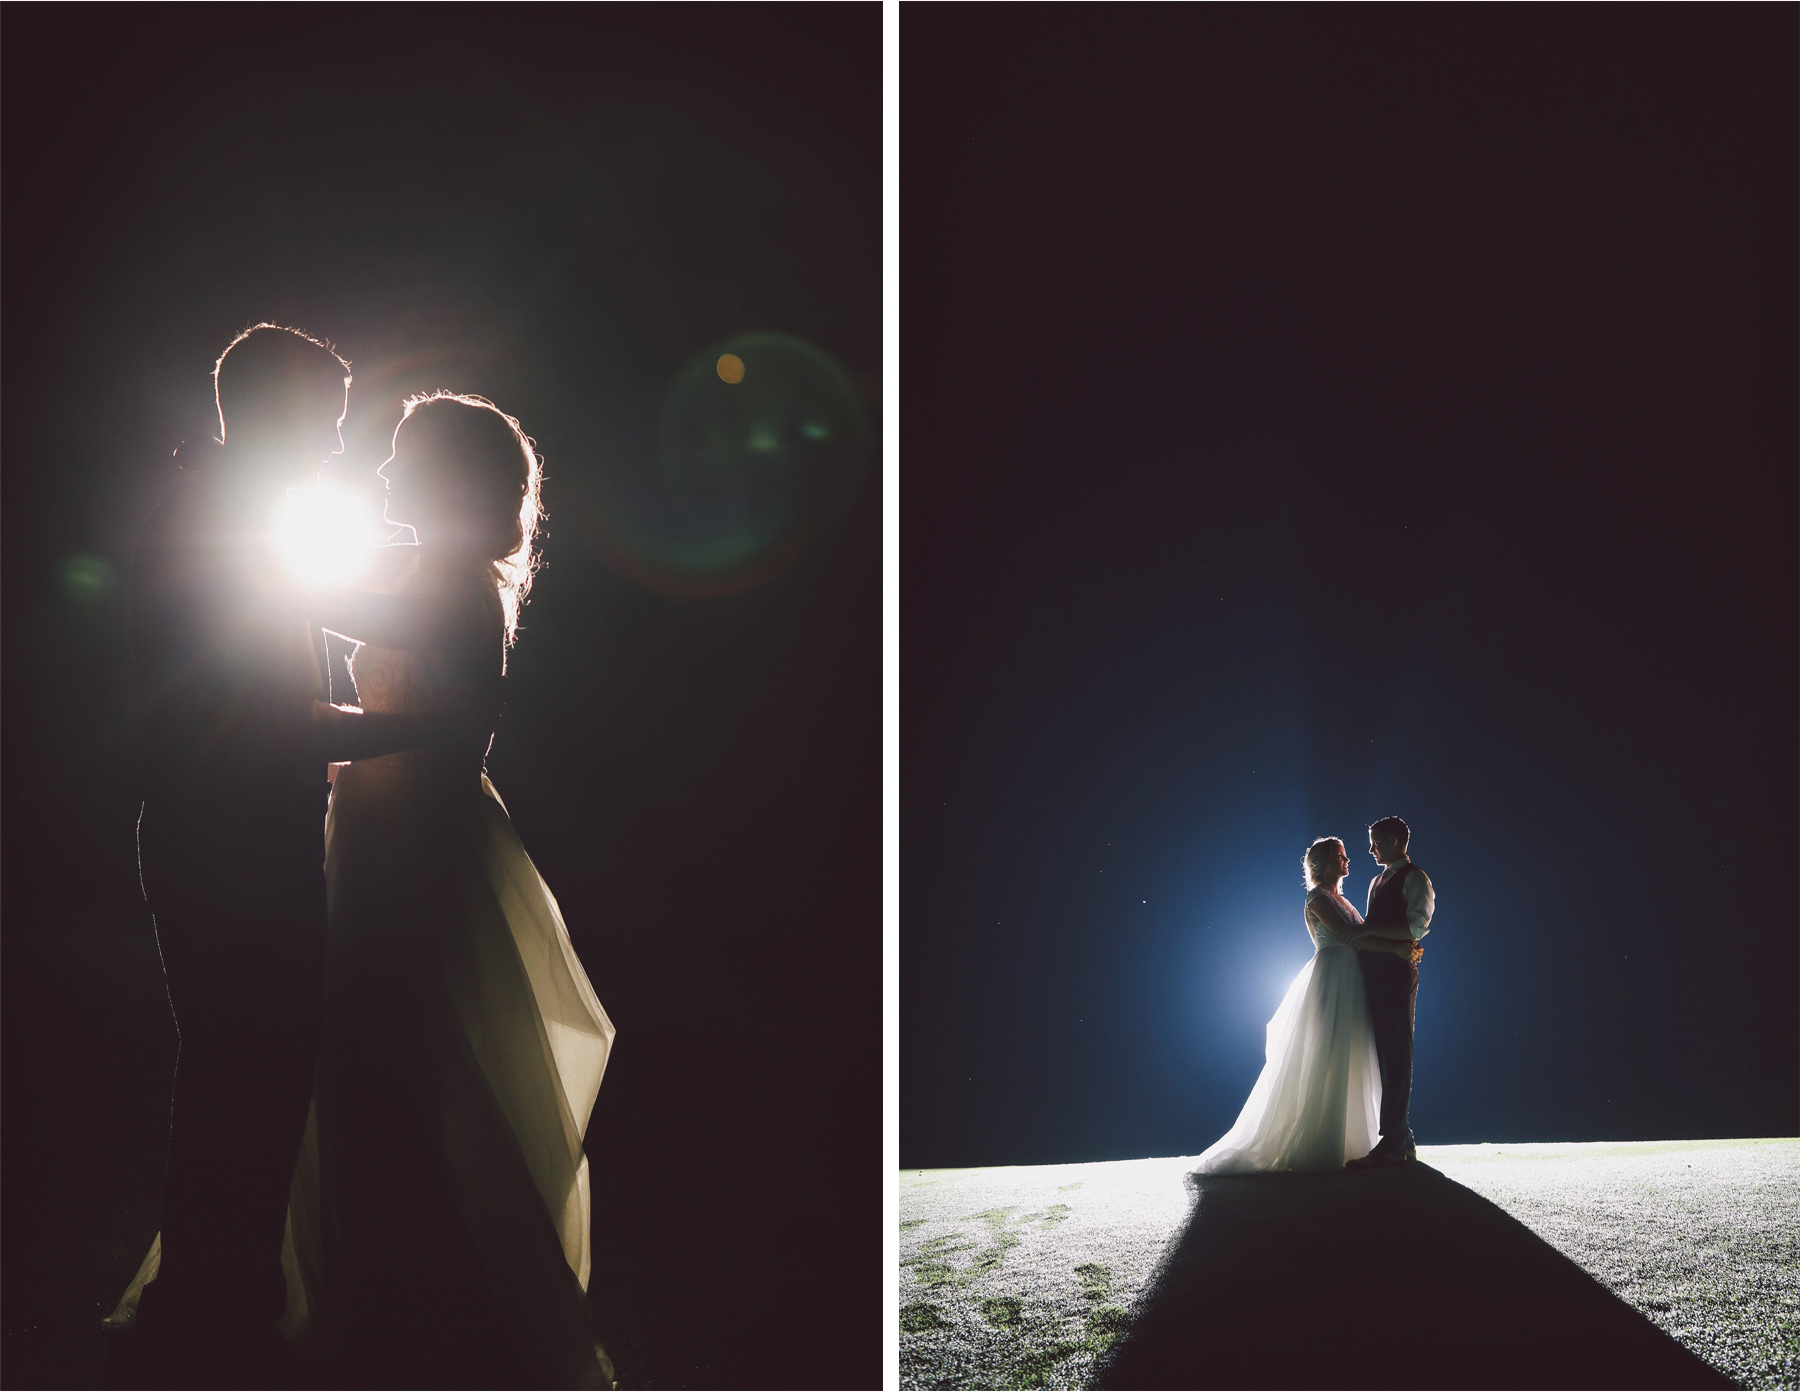 21-Minnetonka-Minnesota-Wedding-Photography-by-Vick-Photography-Lafayette-Club-Night-Photography-Jennifer-and-Adam.jpg